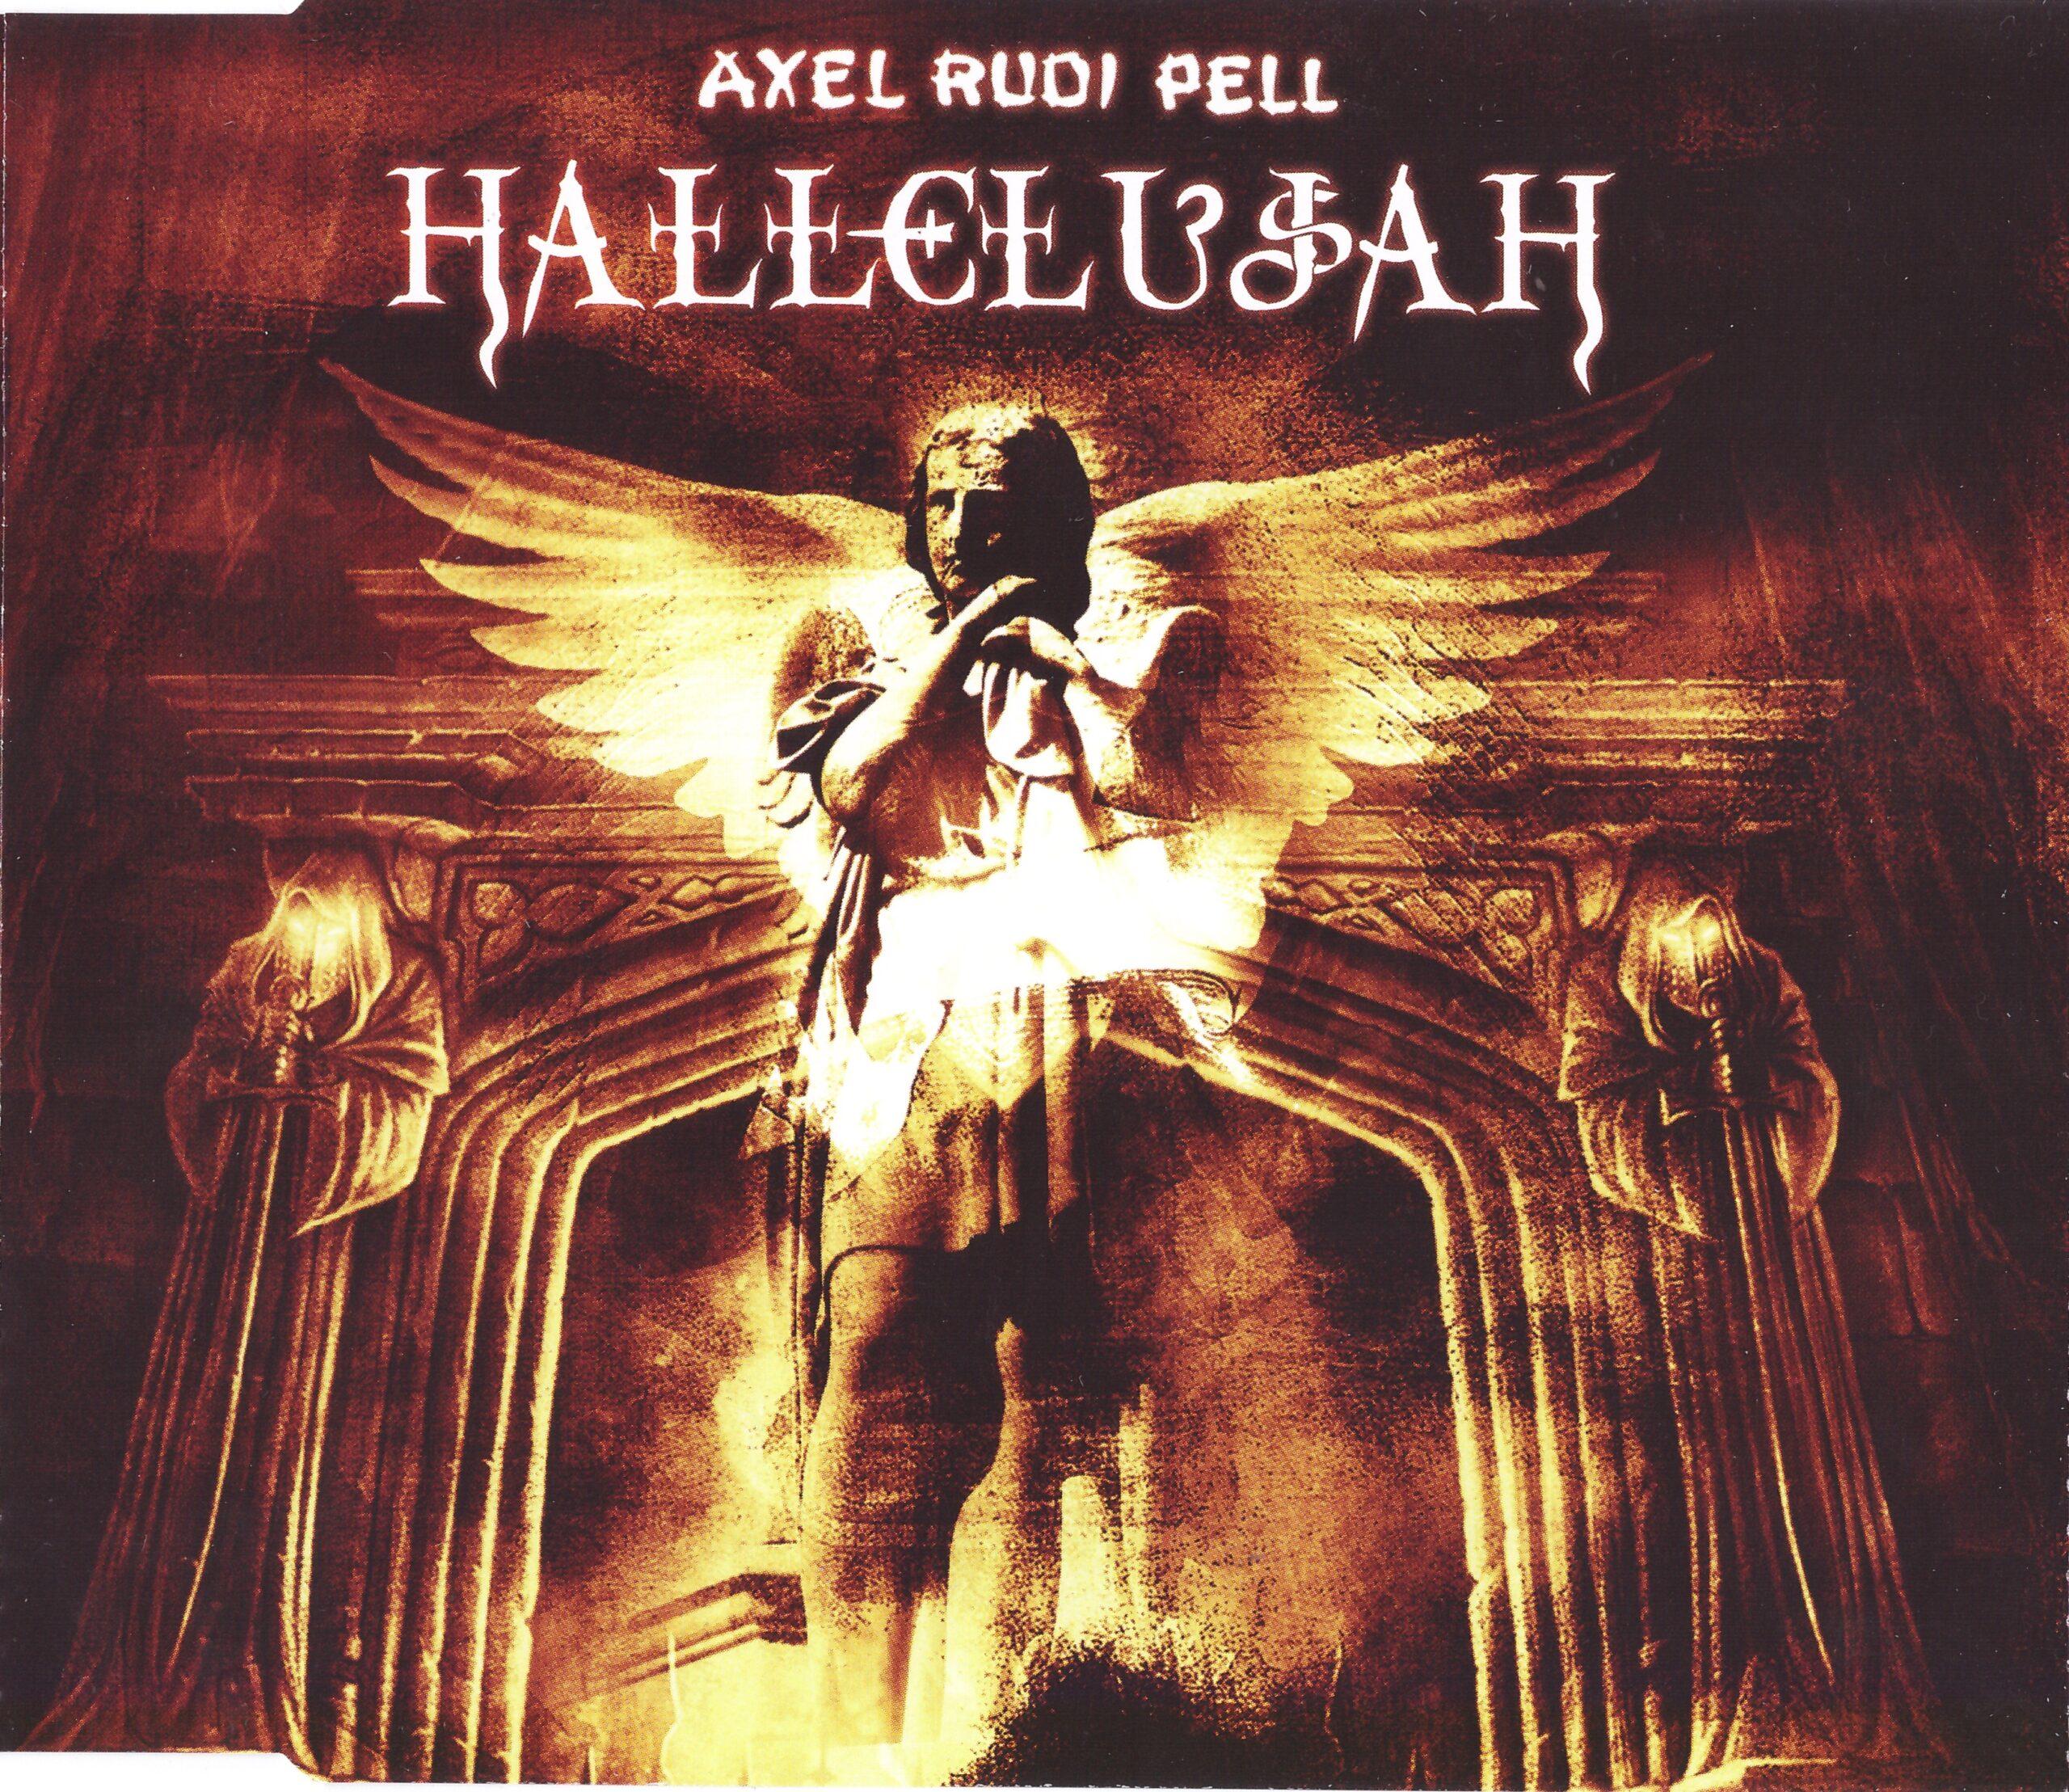 Axel Rudi Pell  — Hallelujah CDS (2011)